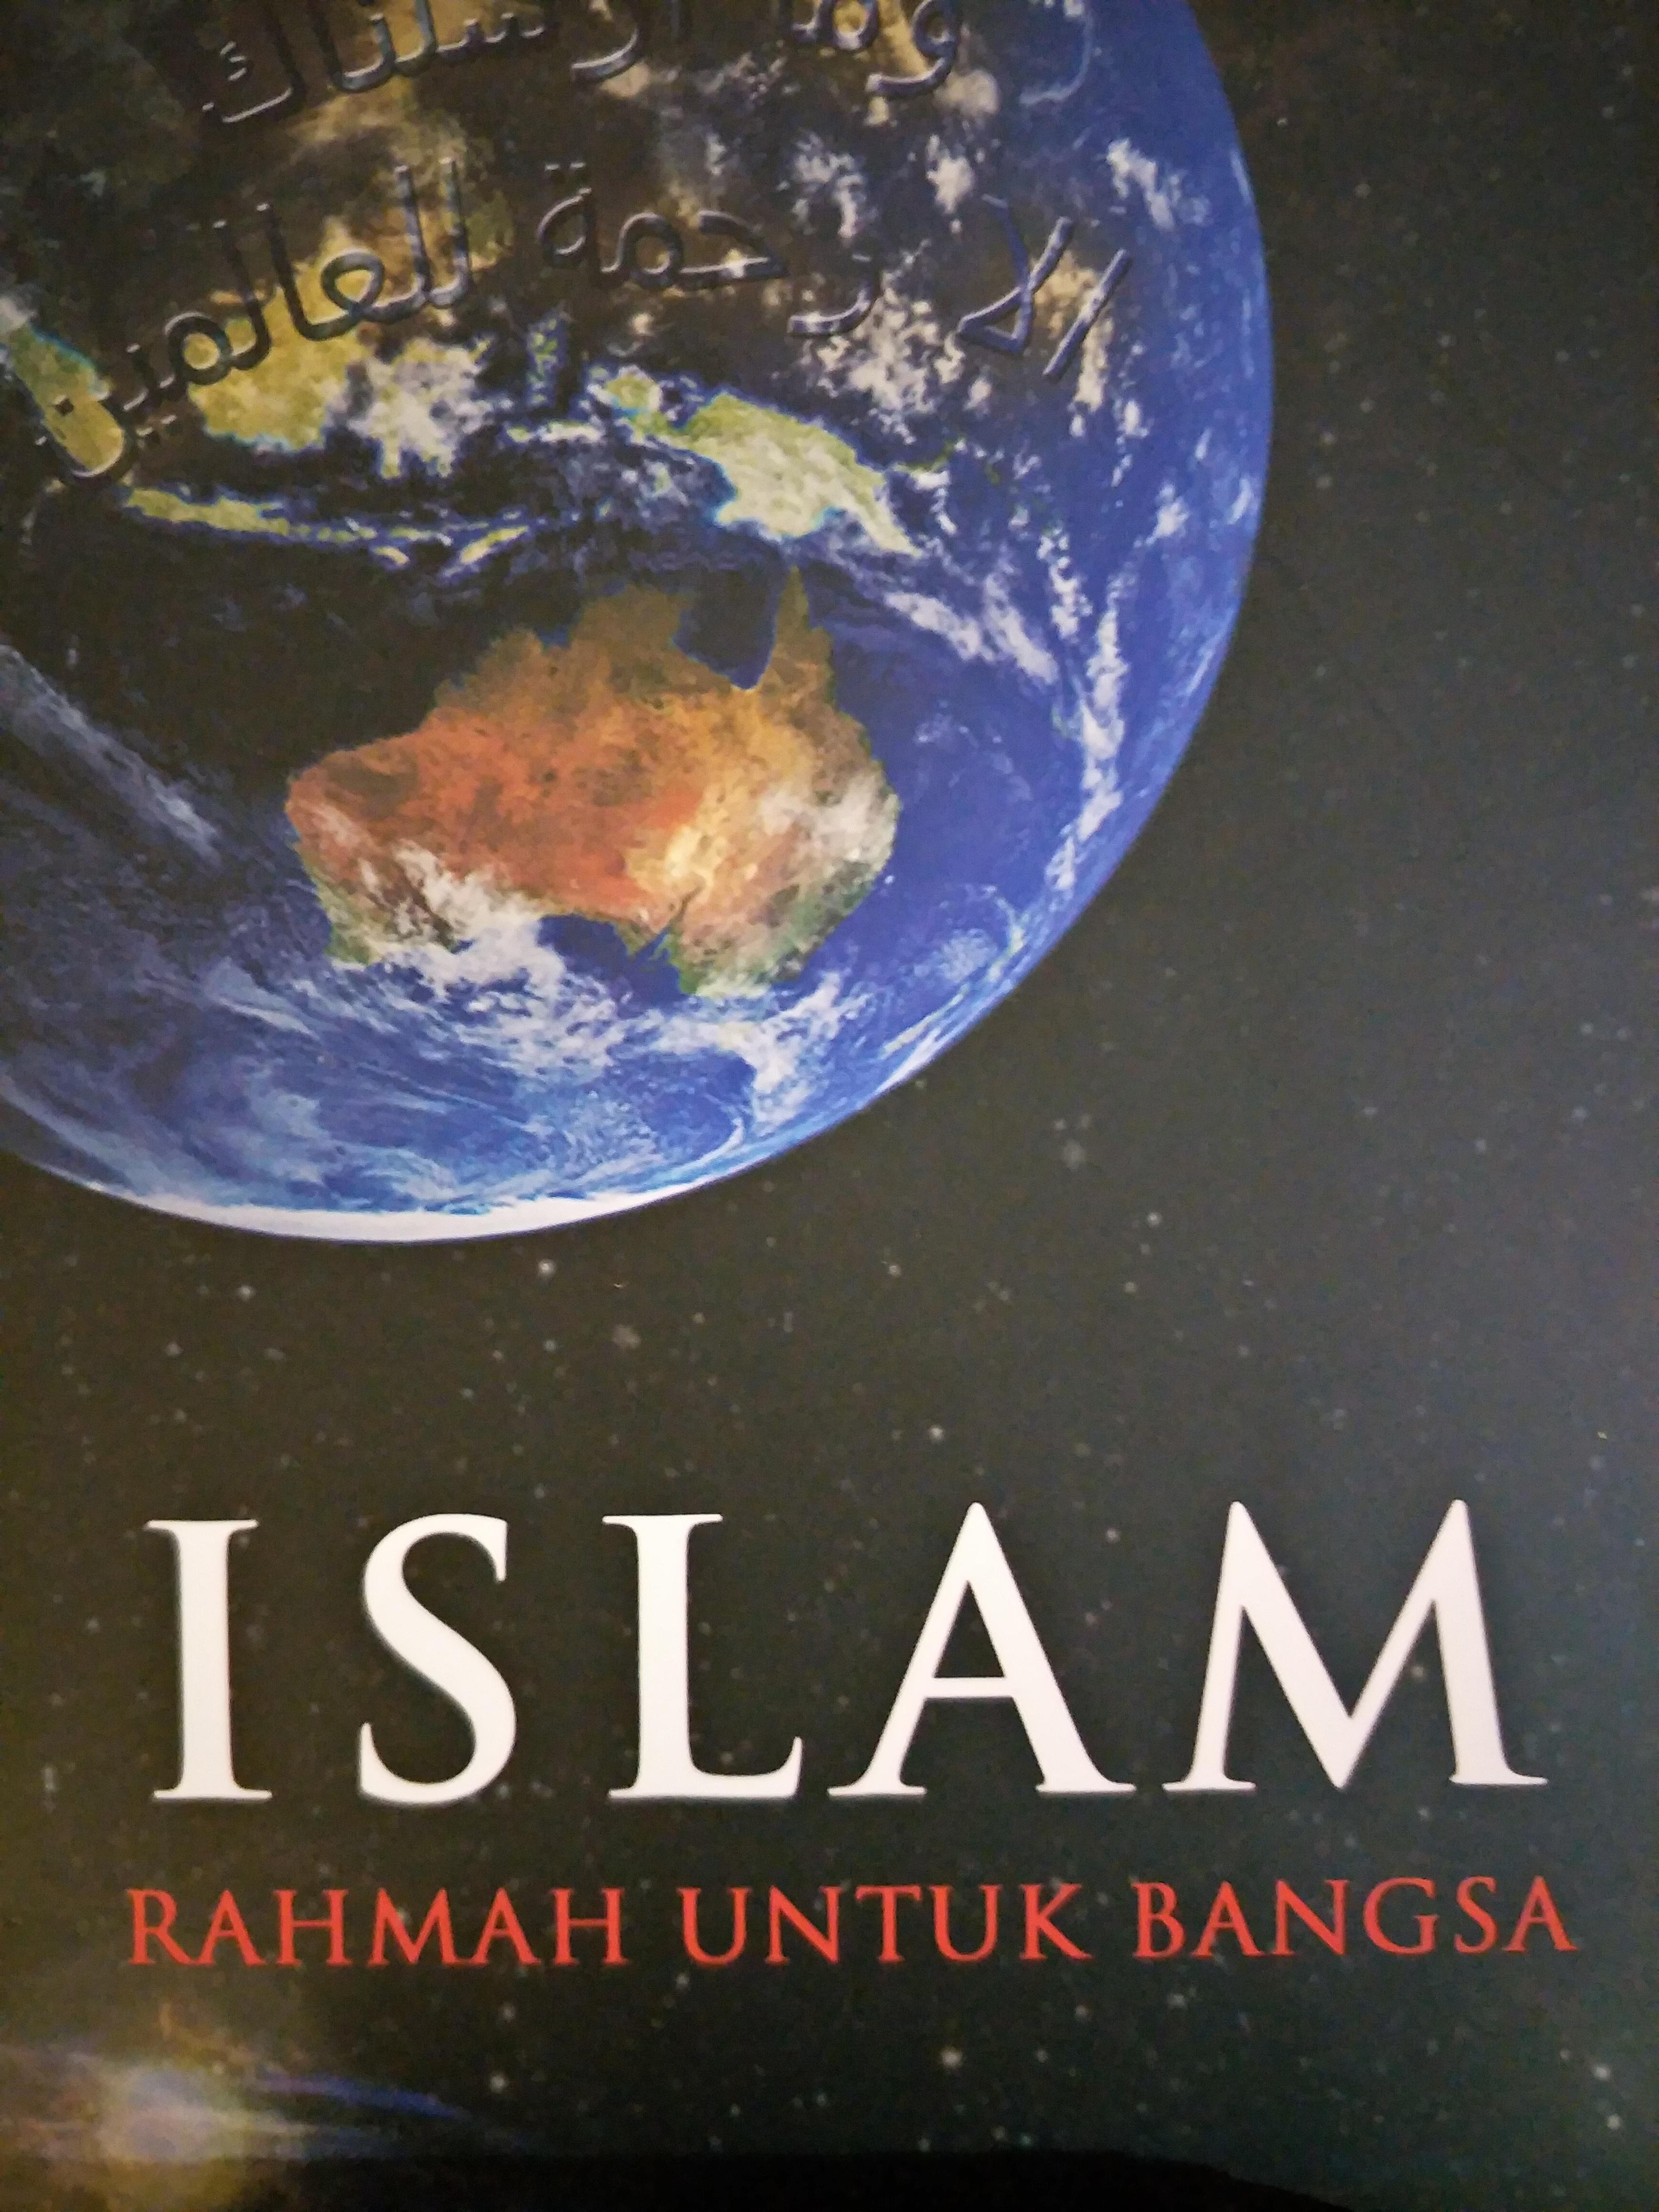 Islam Rahmah.com